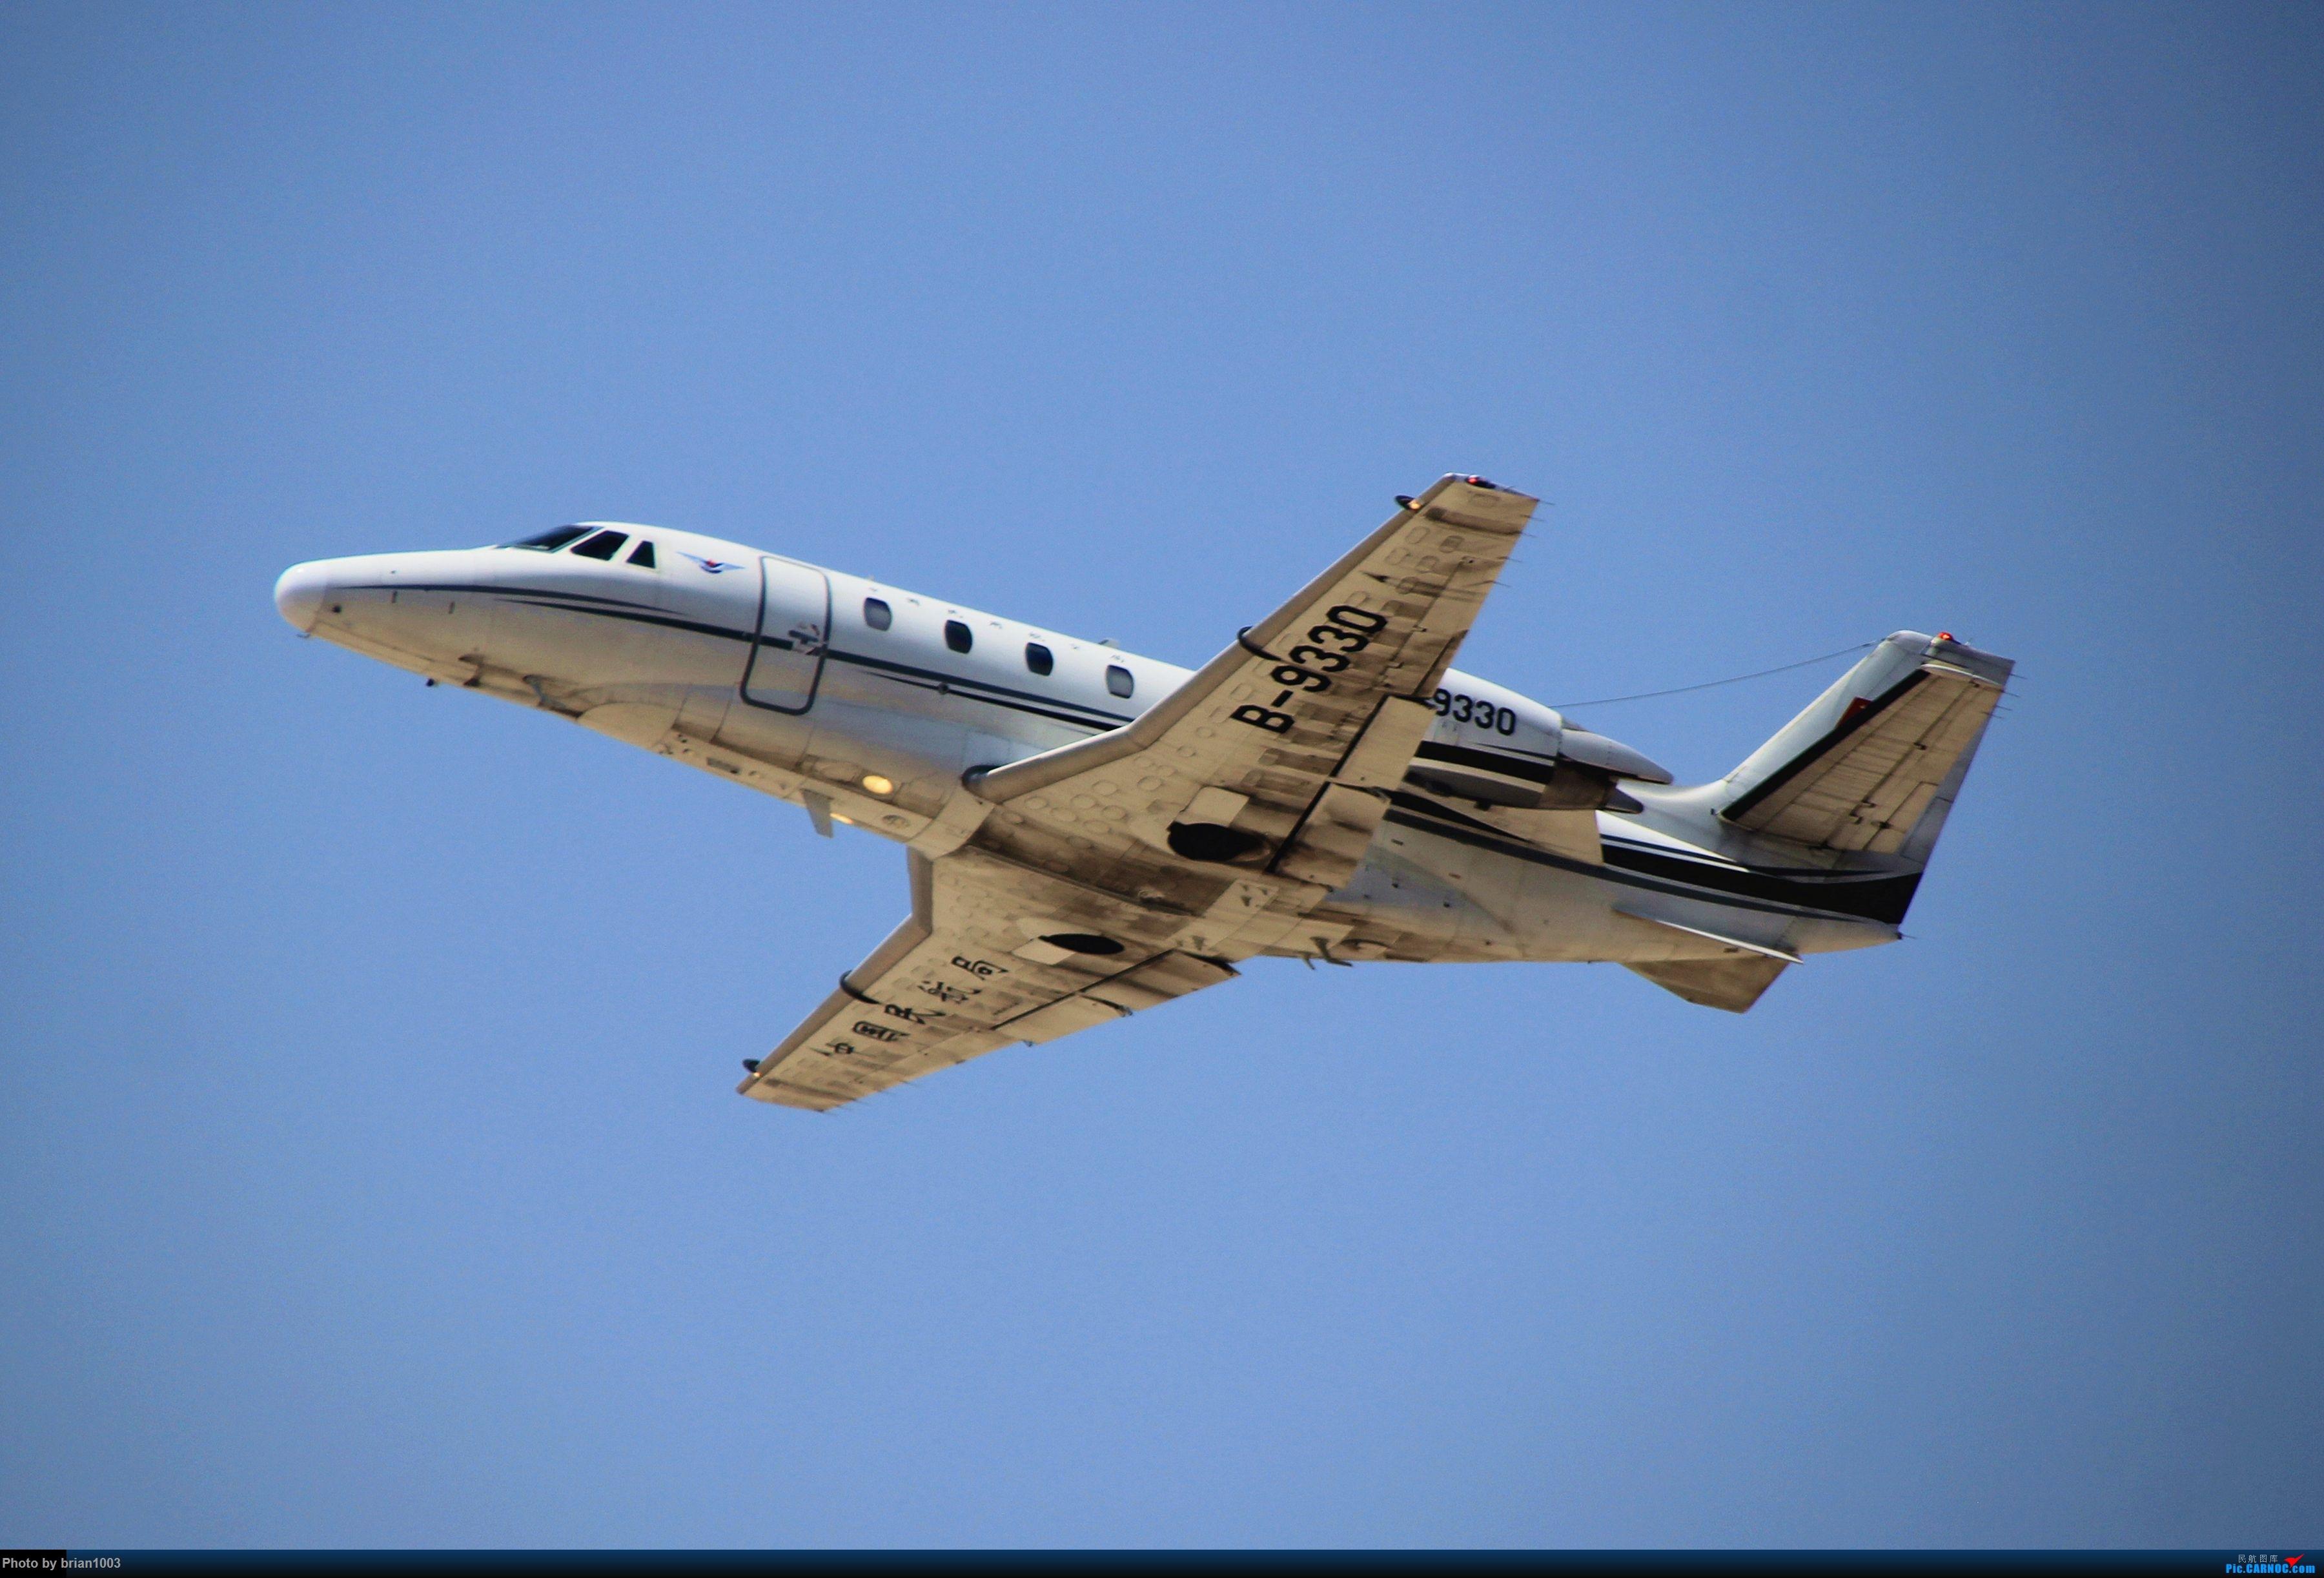 Re:[原创]WUH武汉天河机场拍机之喜迎酷航788和偶遇某其他飞机 CESSNA 560XLS B-9330